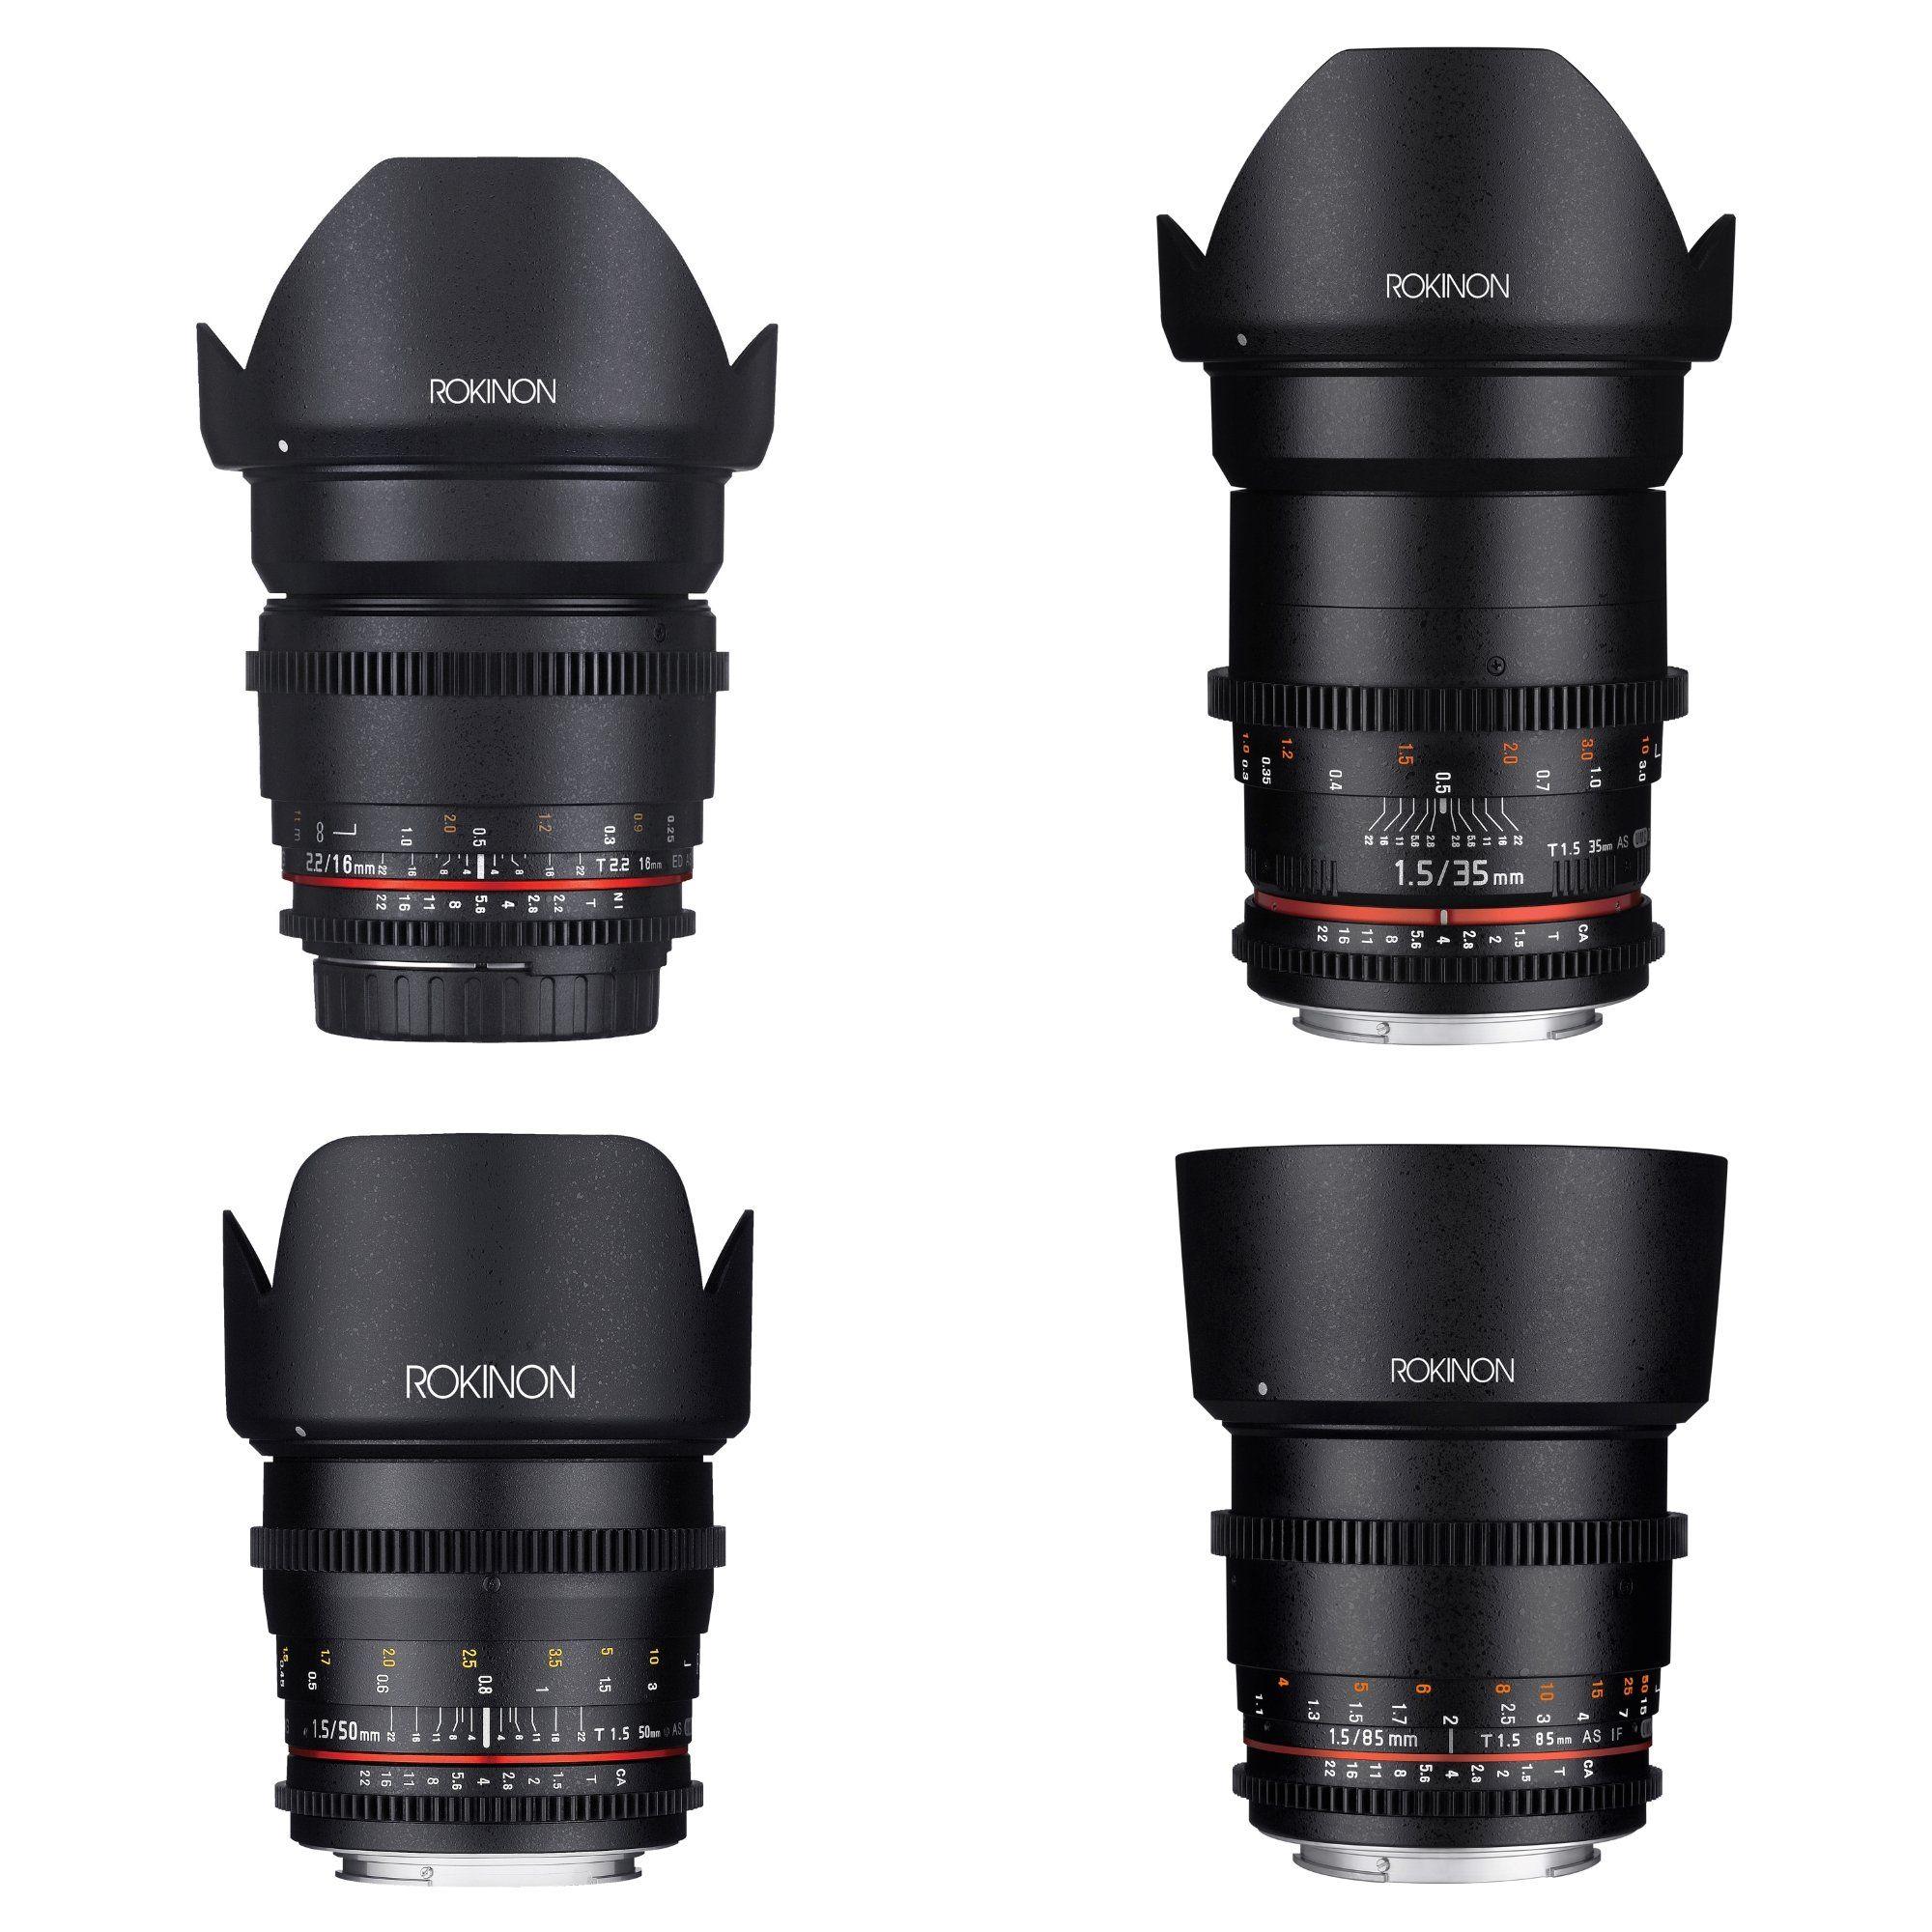 16 35 50 85mm Cine Ds Lens Bundle Canon Ef In 2021 Full Frame Sensor Lens Photo Lens